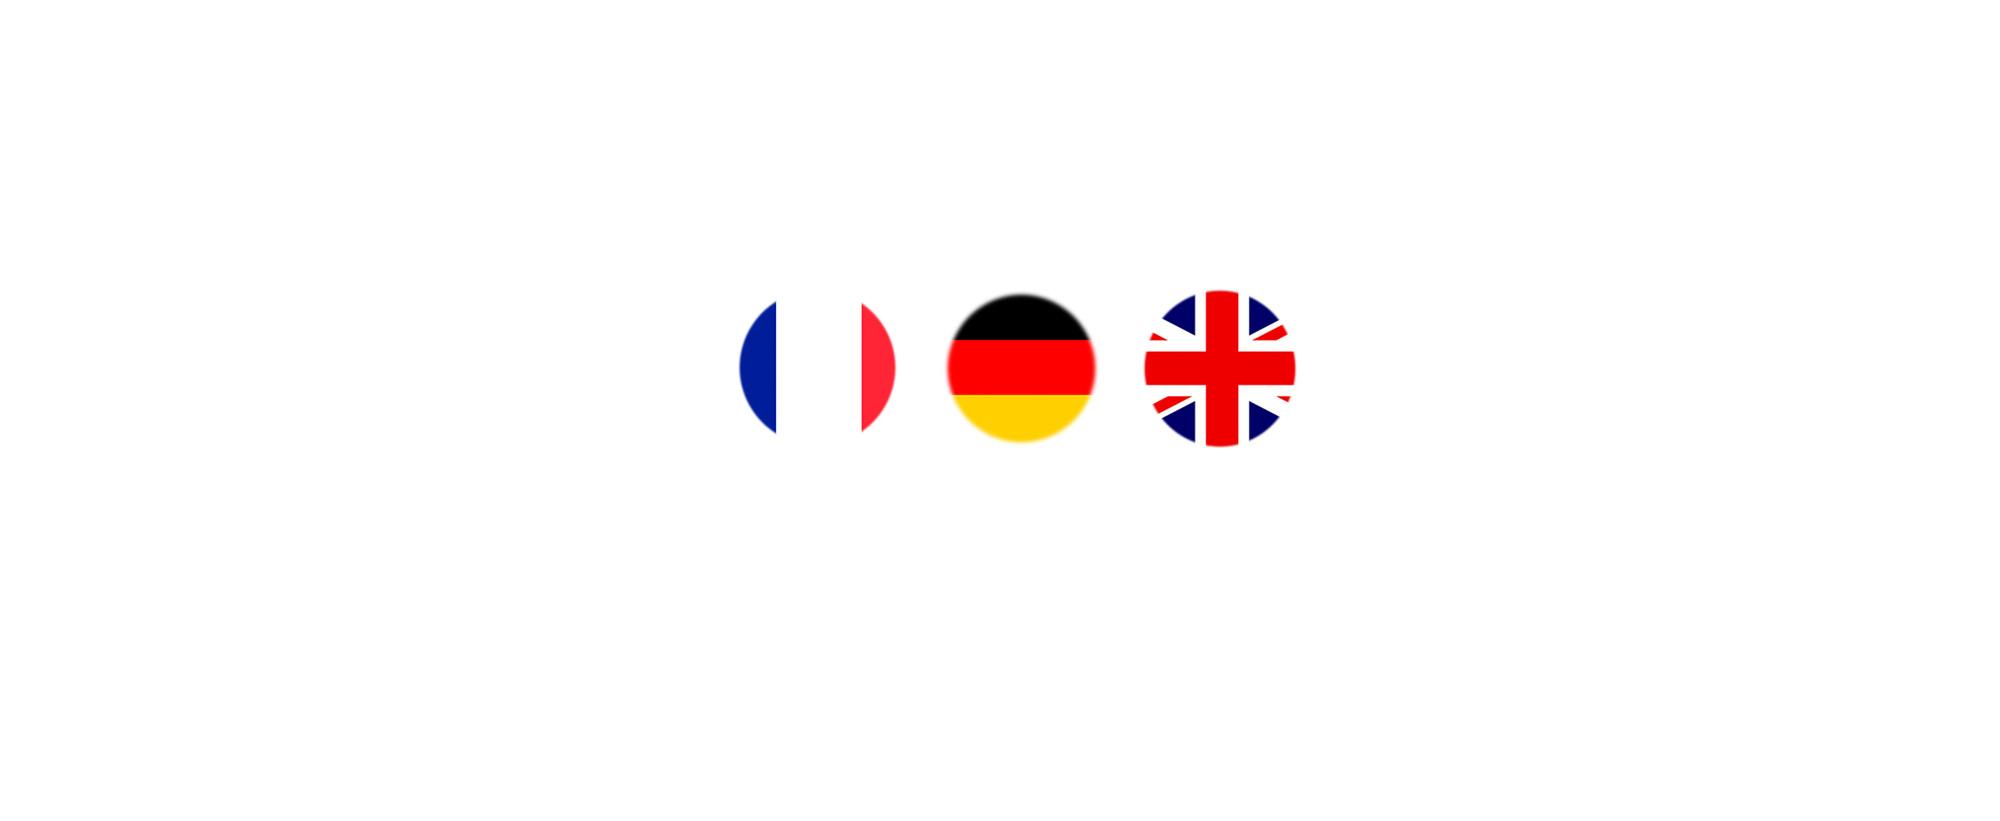 Je parle français, allemand et anglais